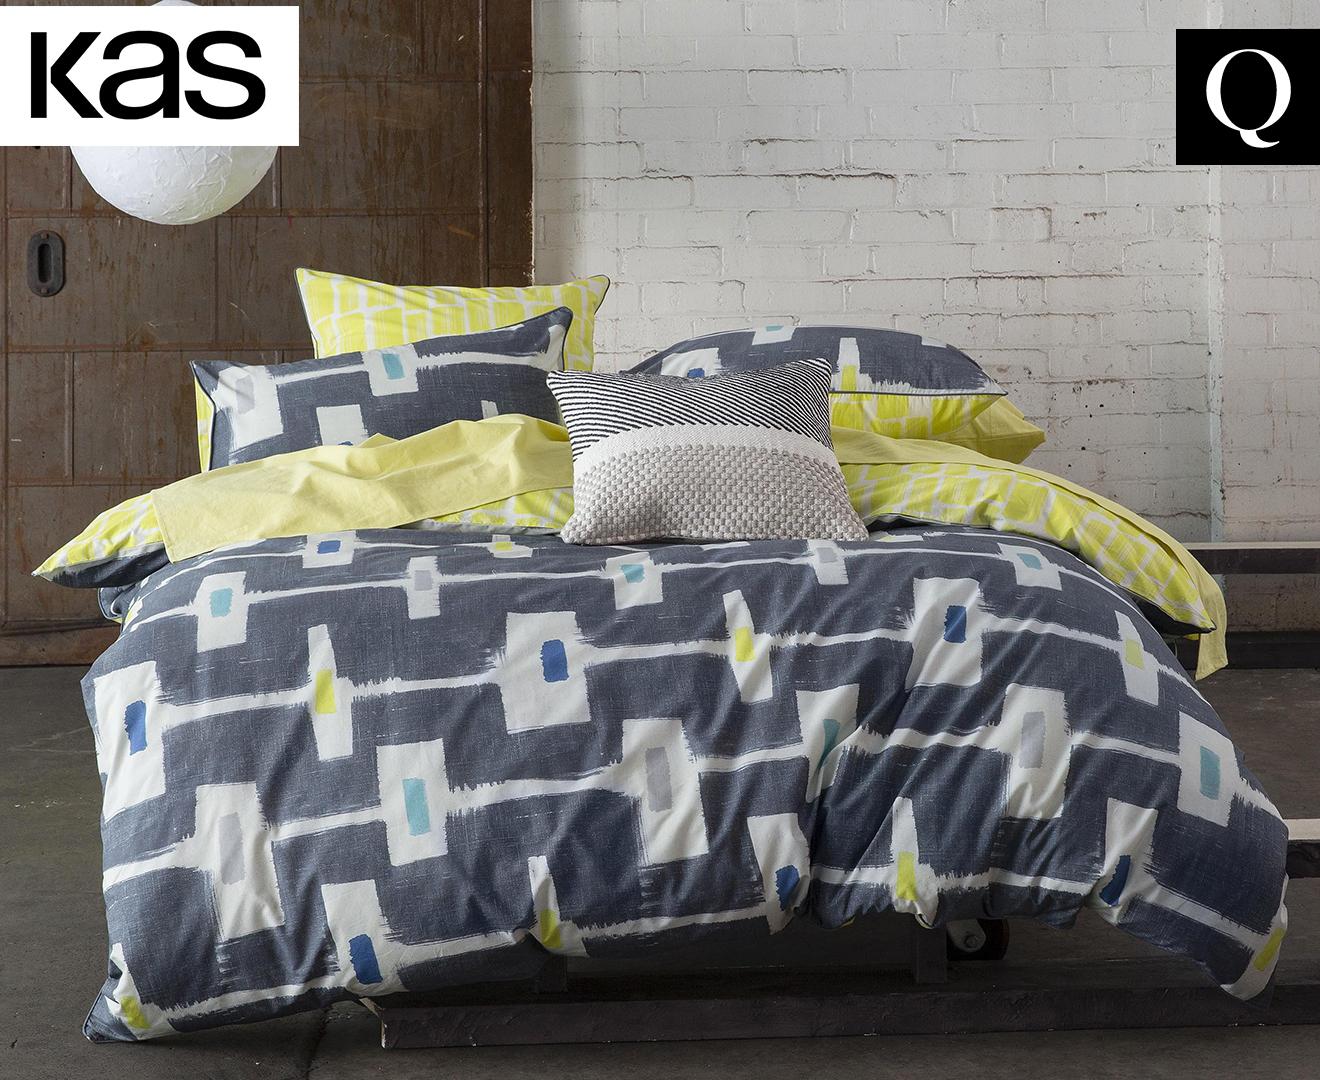 Kas Alika Queen Bed Quilt Cover Set Multi Catch Com Au